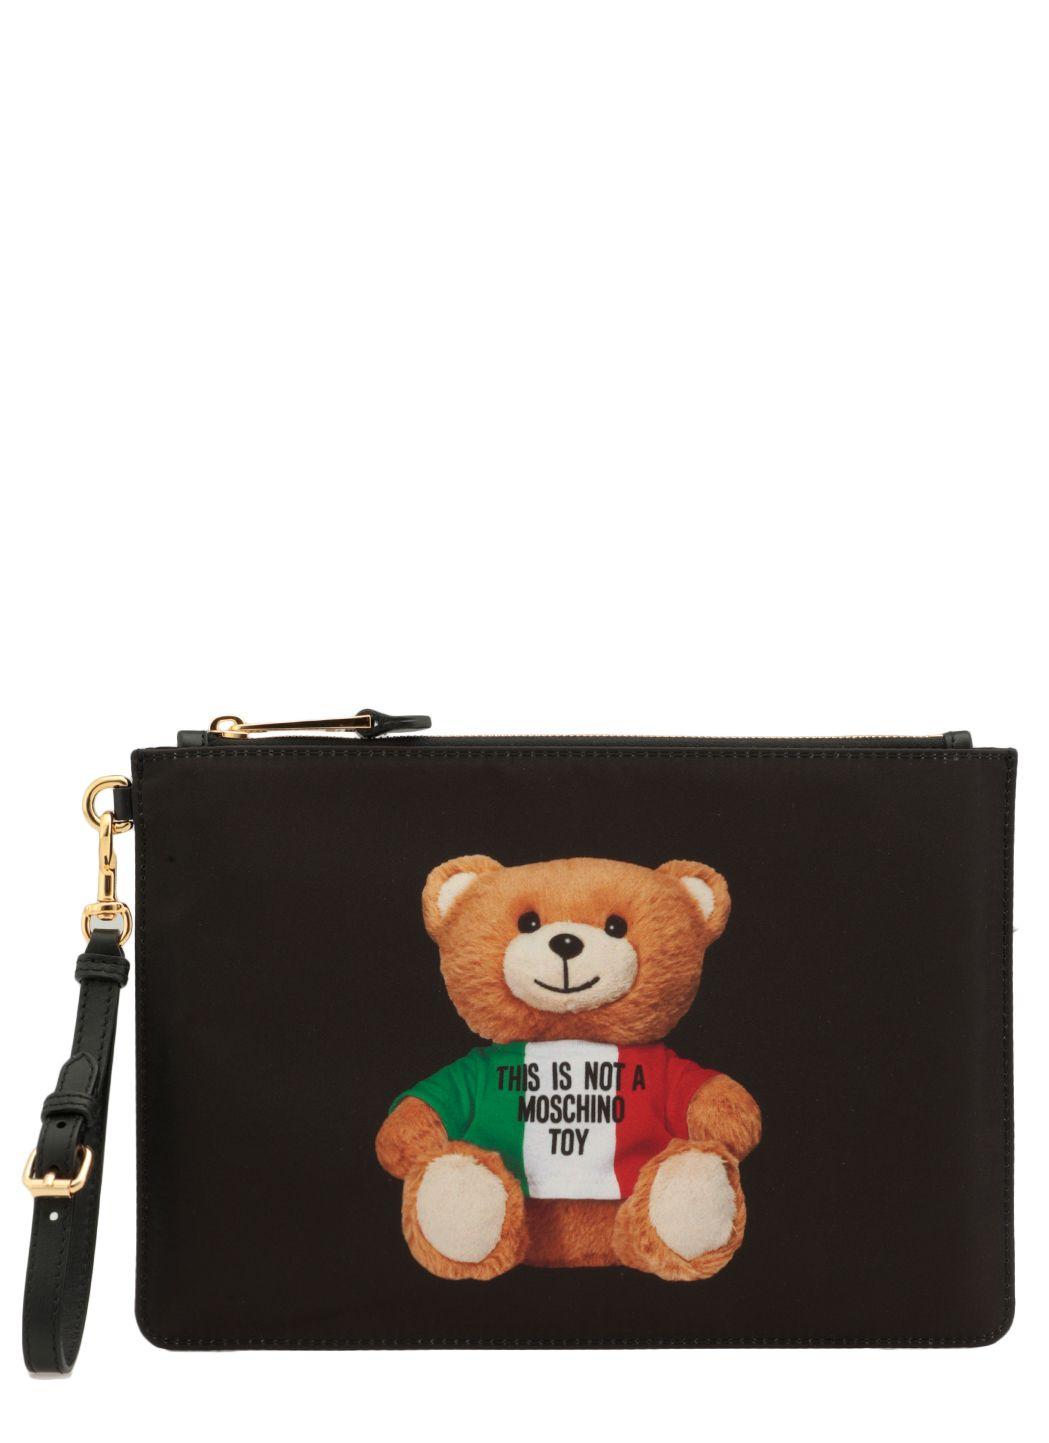 Teddy Bear pouche